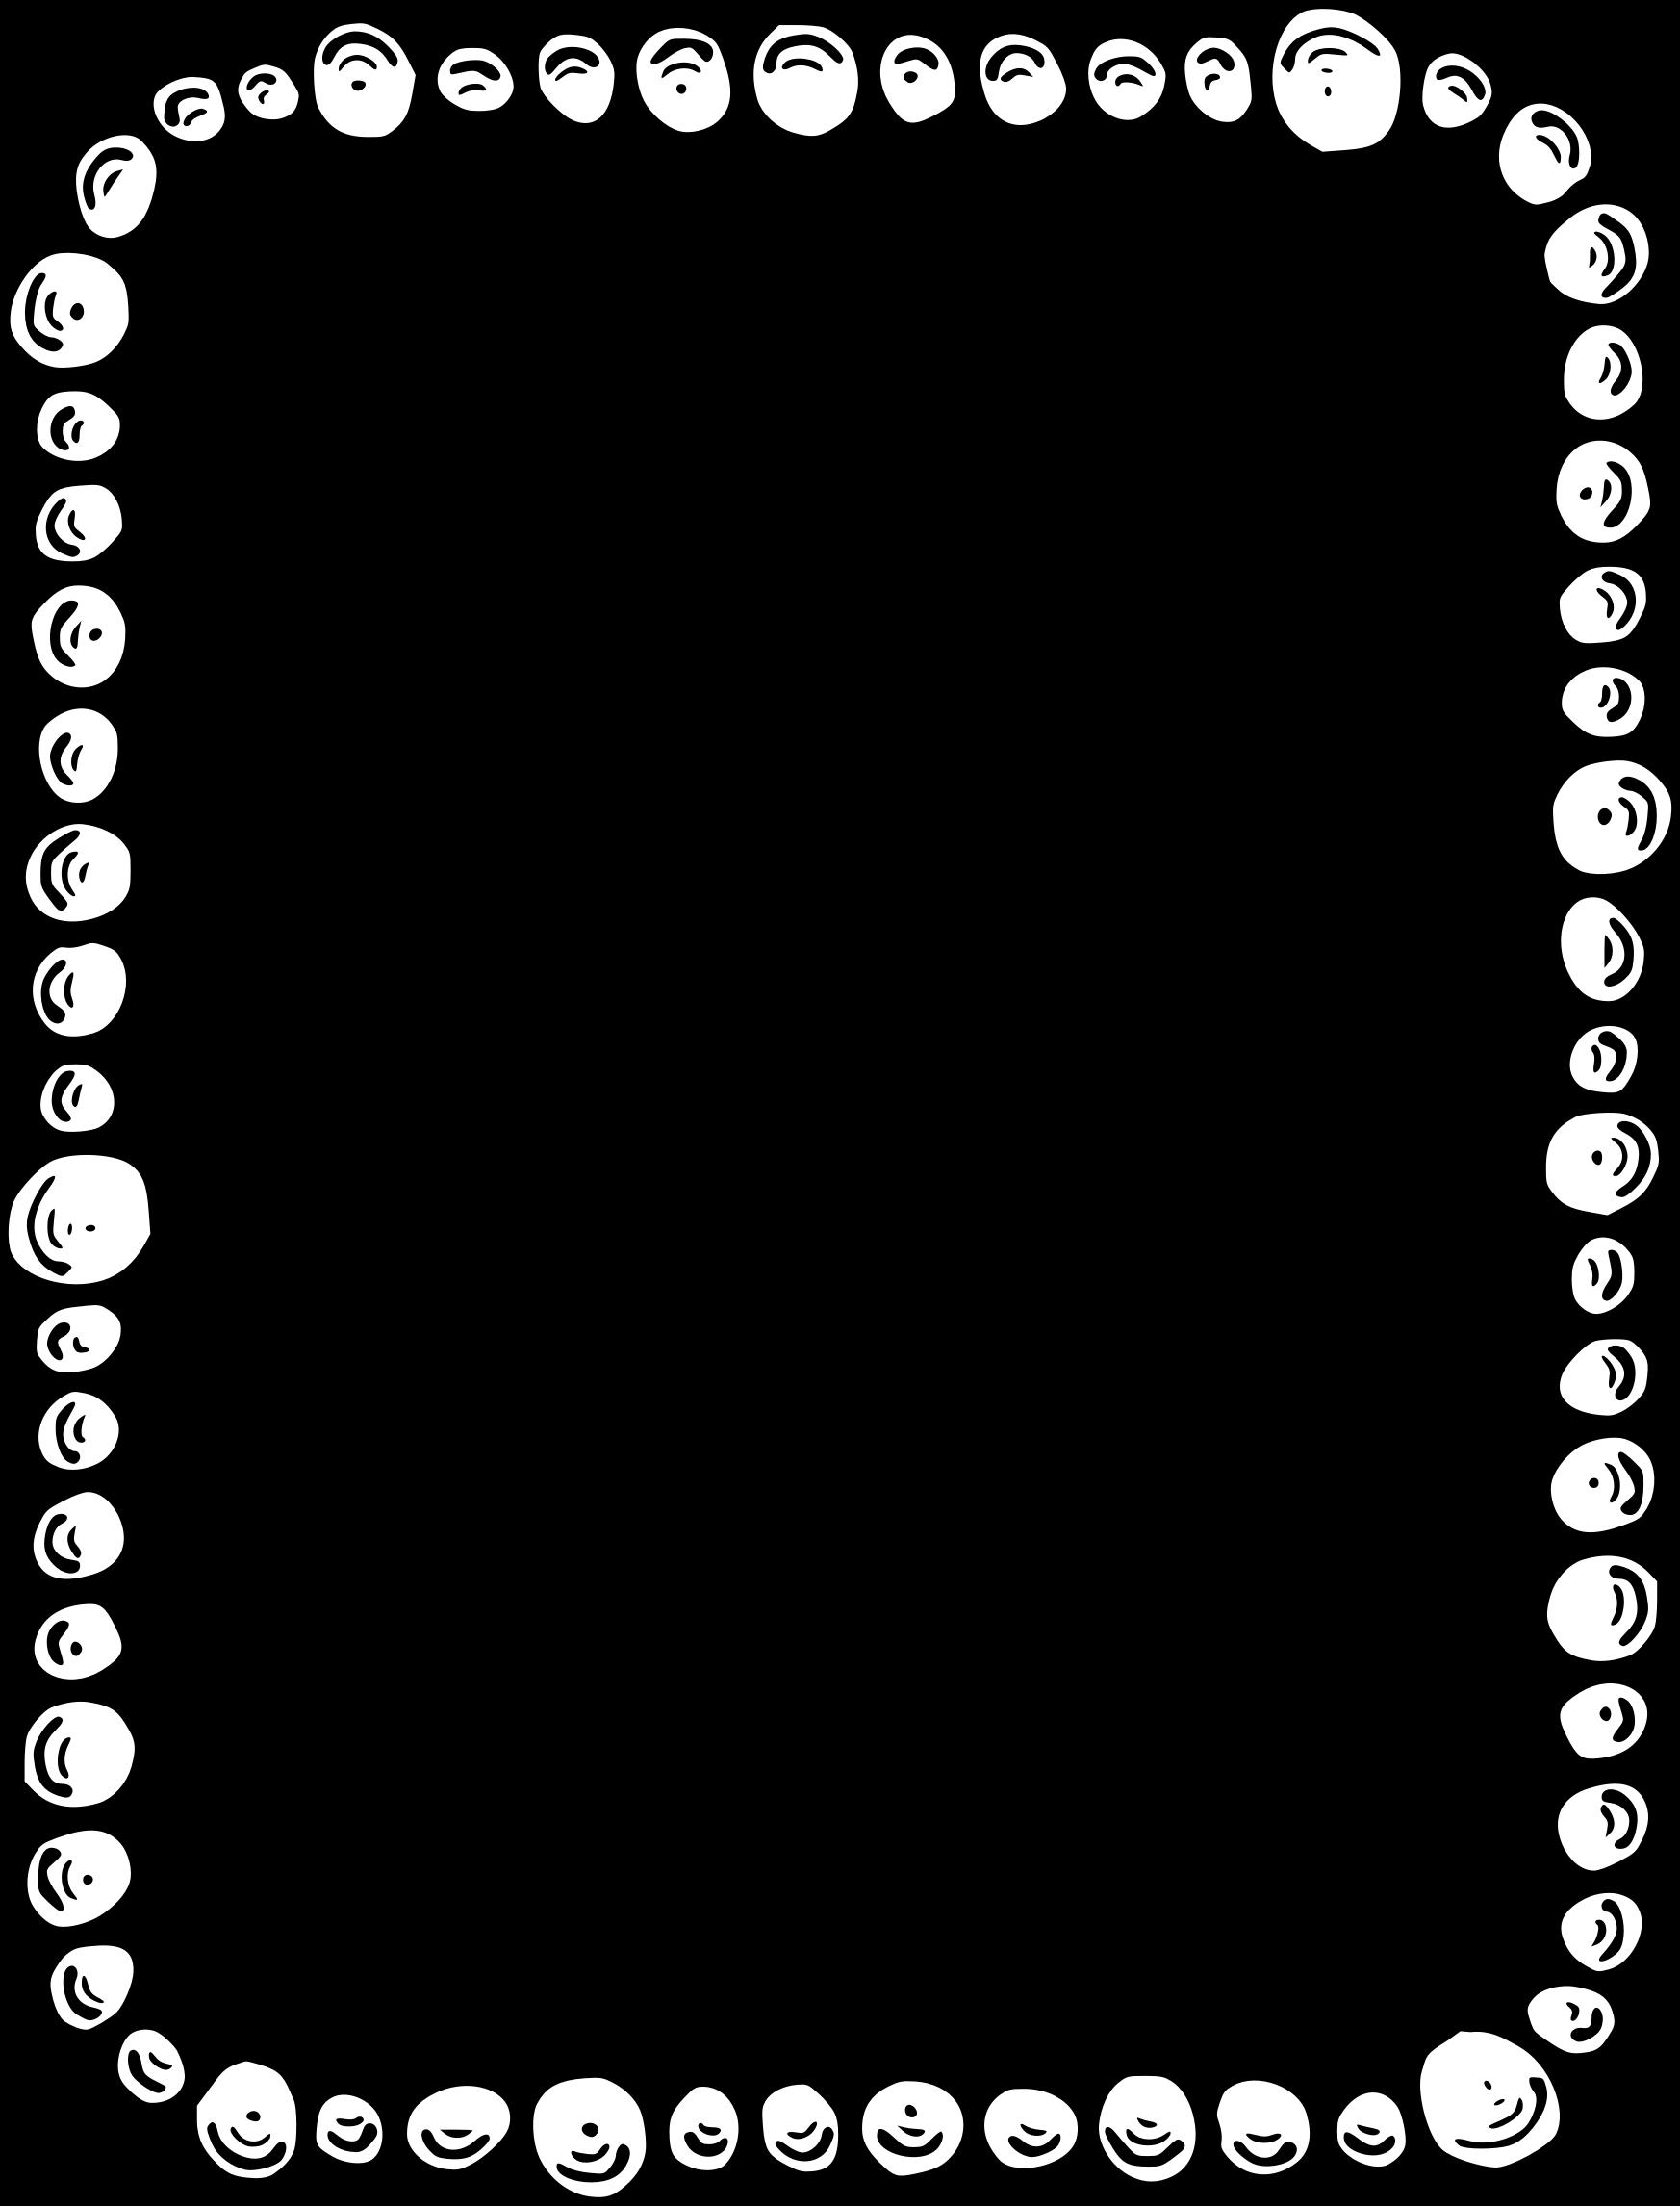 Pebble border big image. Clipart frames science